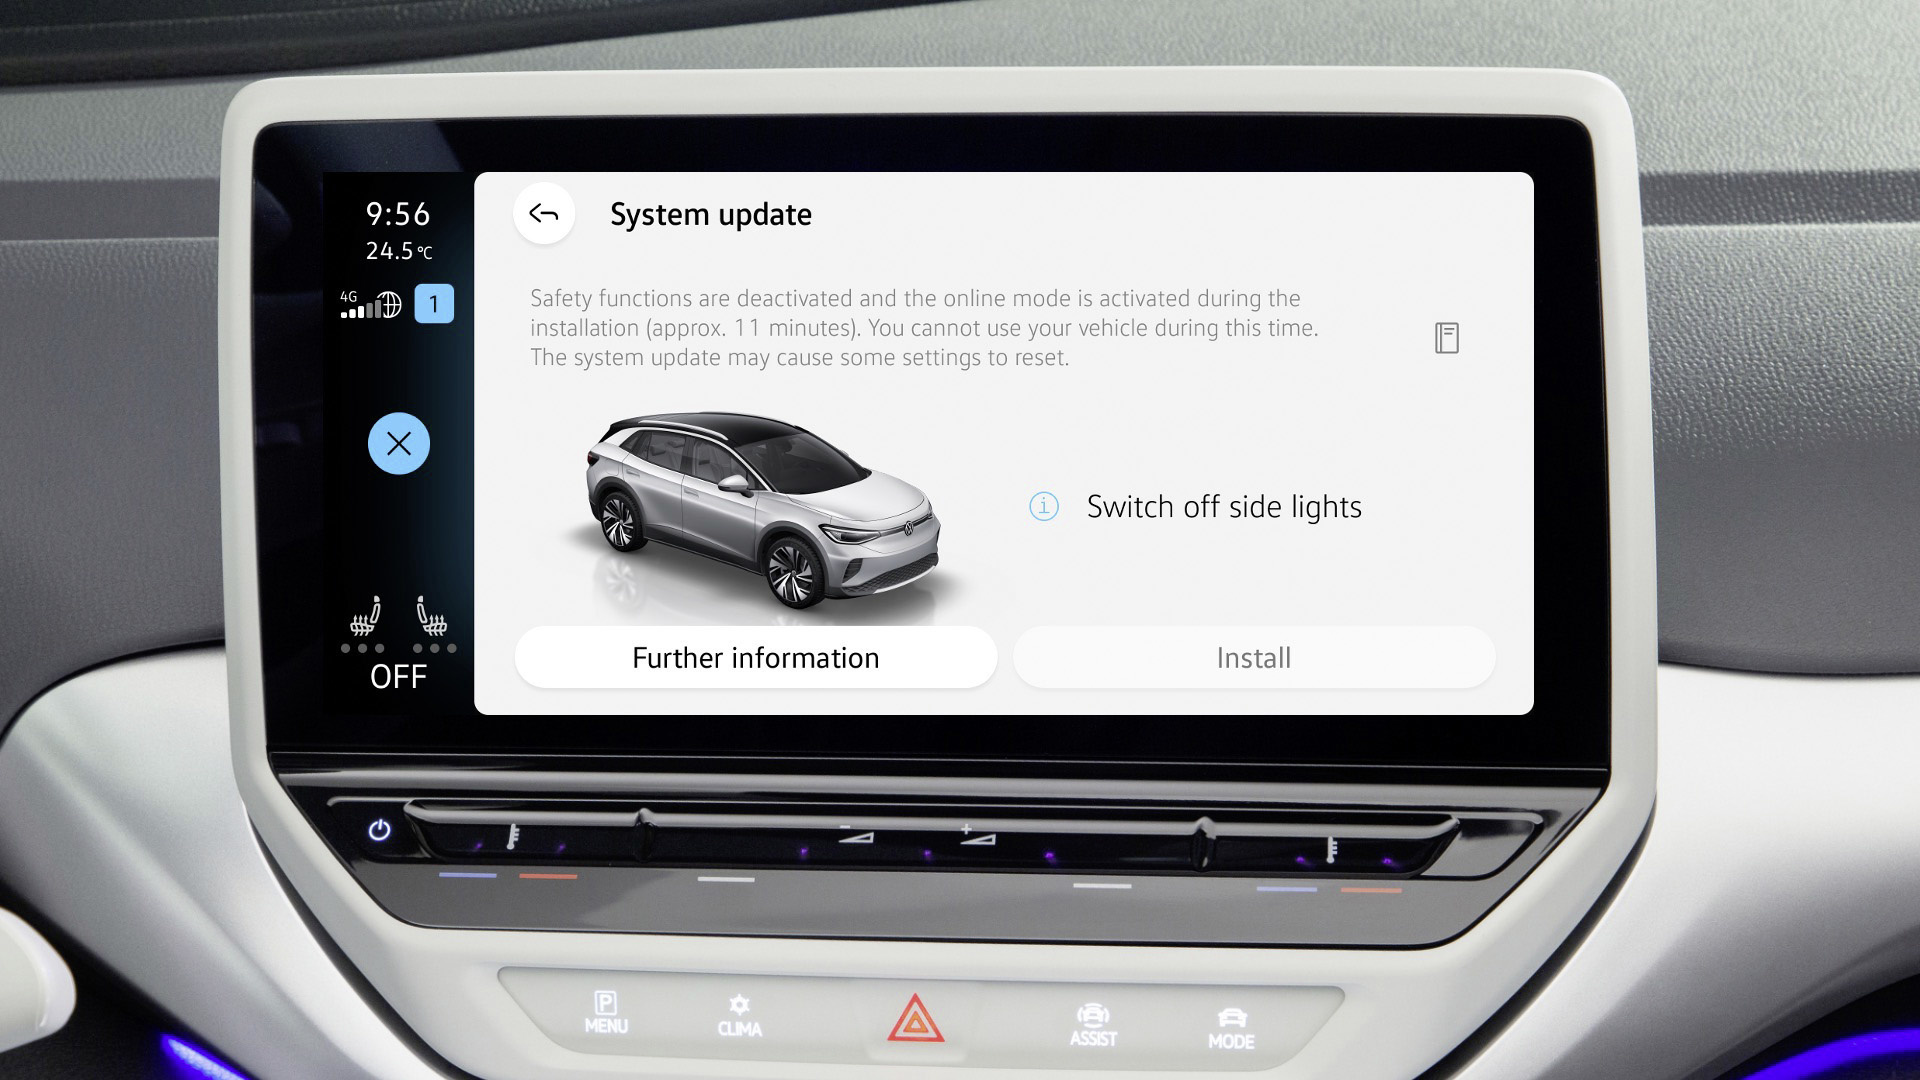 Over The Air Updates για όλα τα ηλεκτρικά αυτοκίνητα της VW